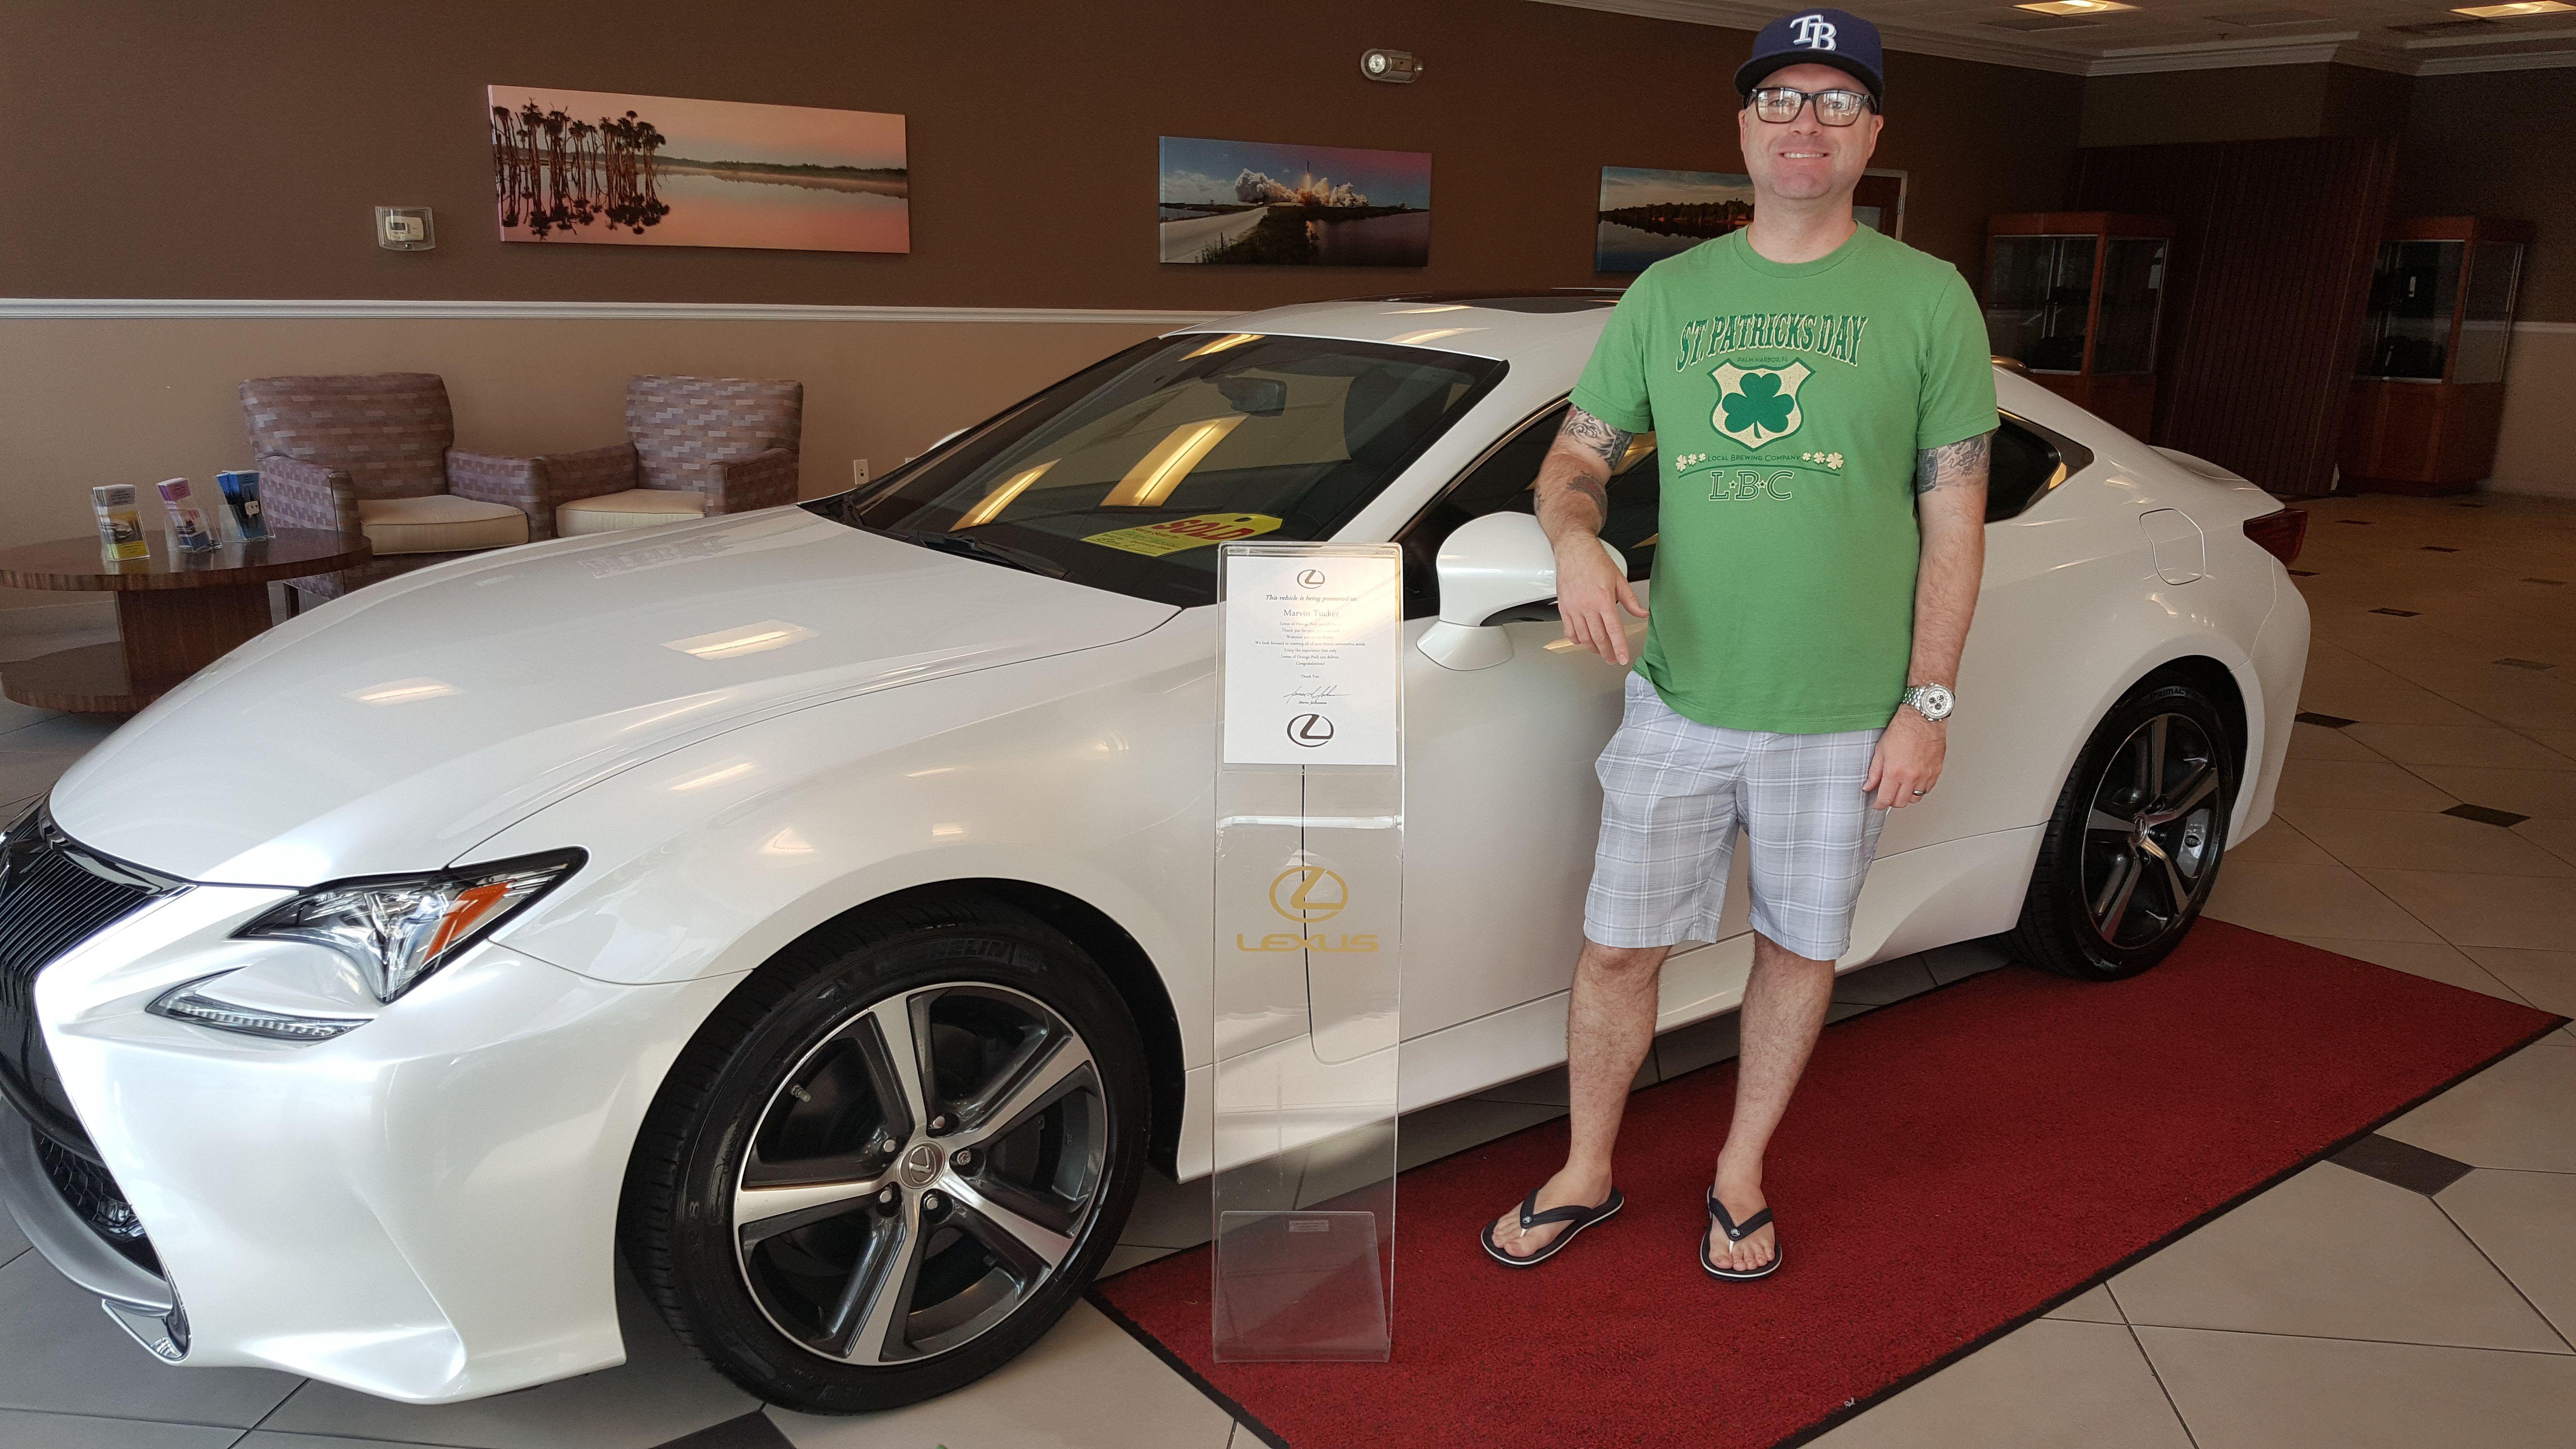 Congratulations To Marvin T On The Purchase Of His 2017 Lexus Rc200t From Our Team Member Steve At Lexus Of Orange Park Than Lexus Lexus Dealer Orange Park